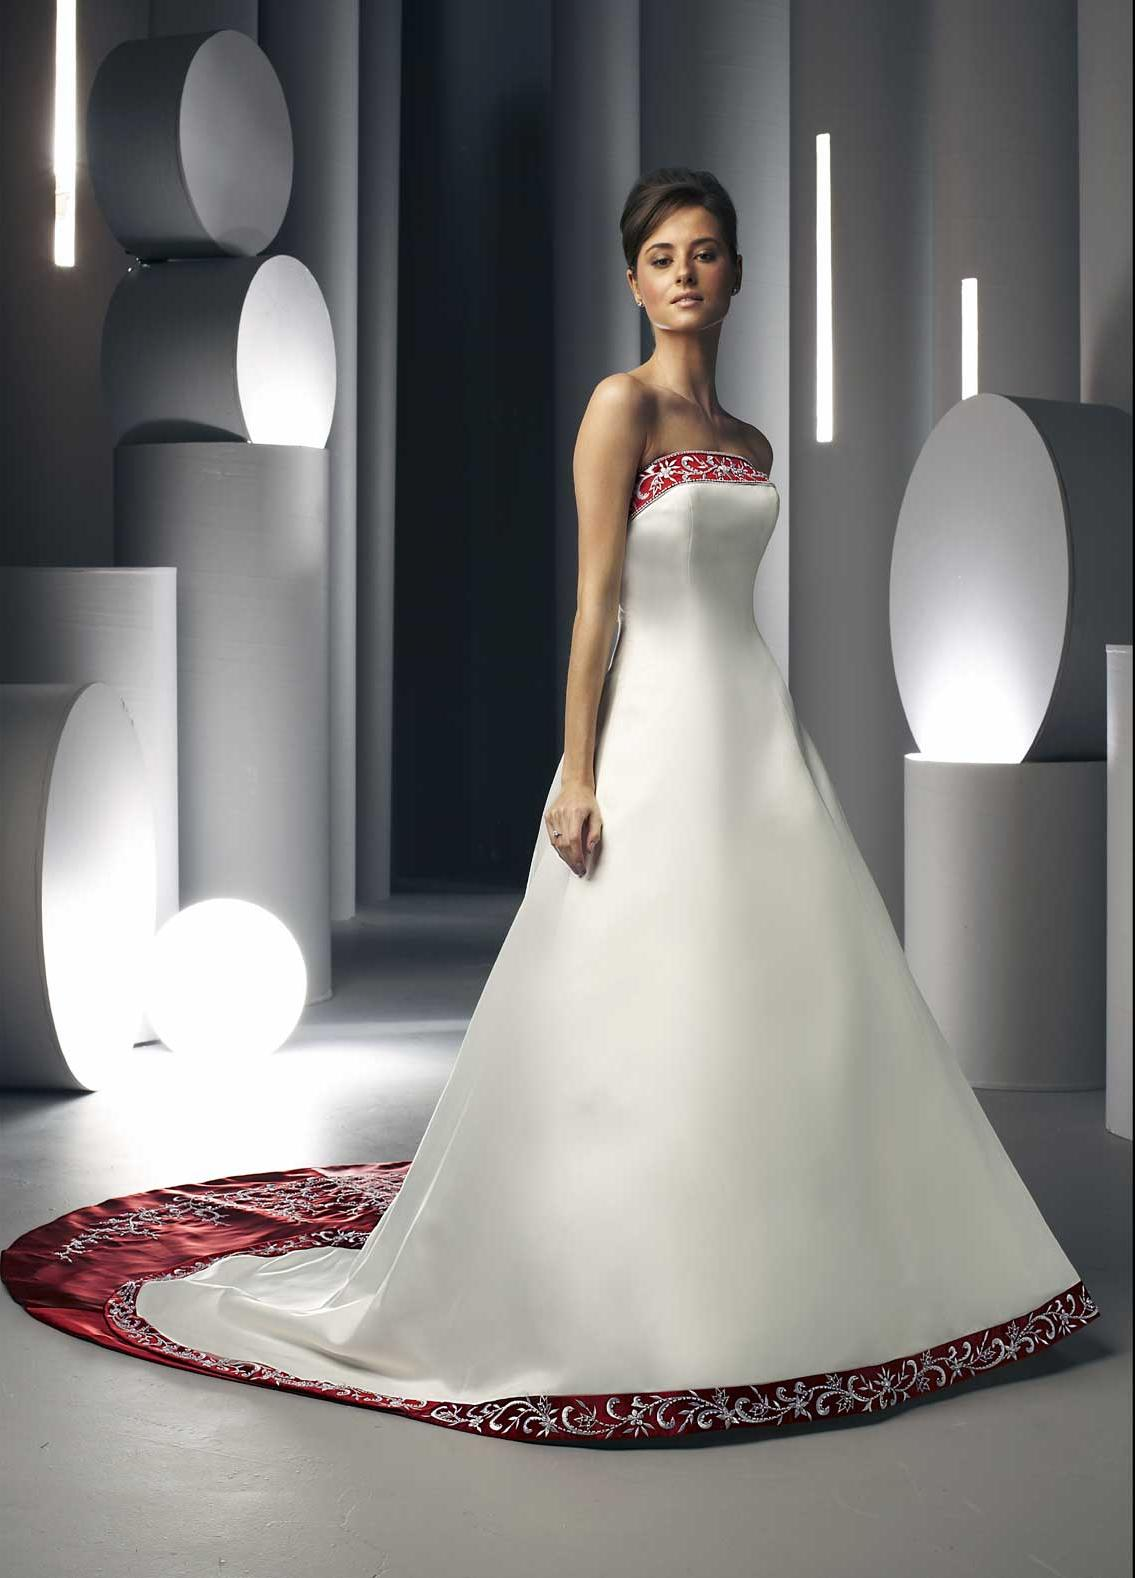 Delisha S Blog Diy Moss Wedding Centerpieces